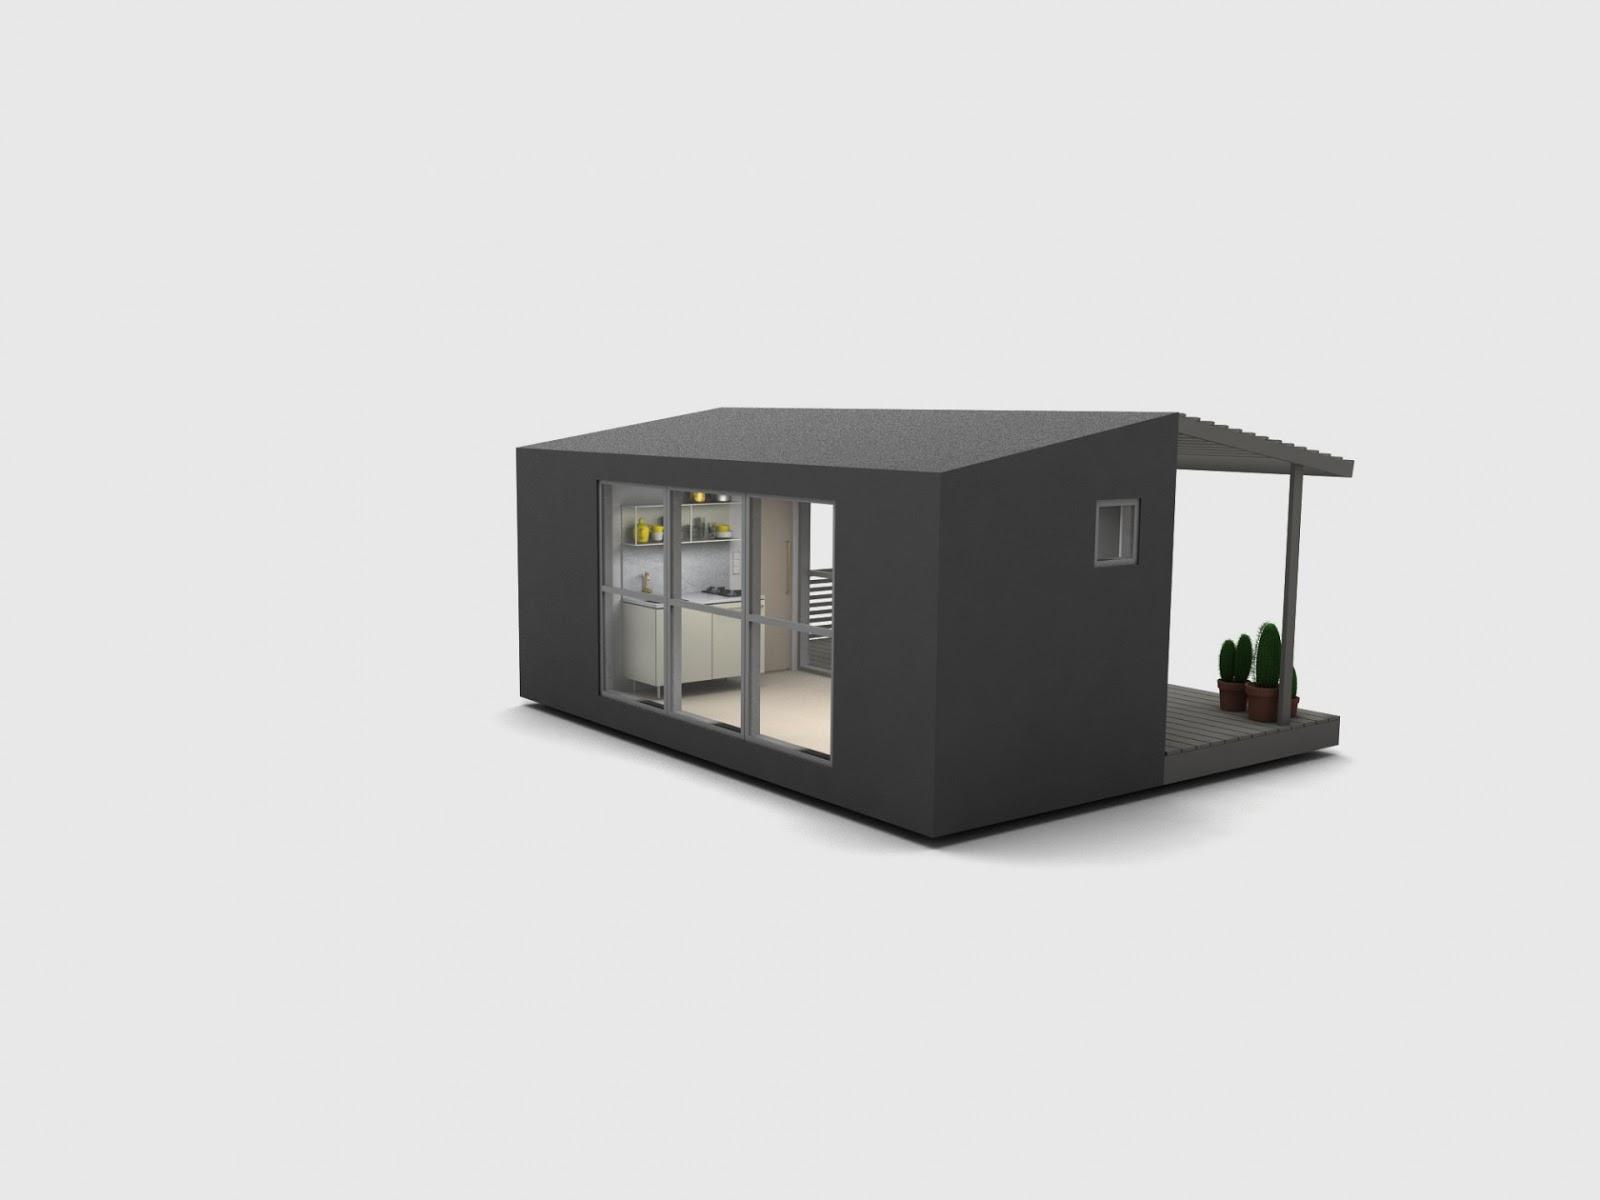 Casas modulares y prefabricadas de dise o mini house la - Mini casas prefabricadas ...